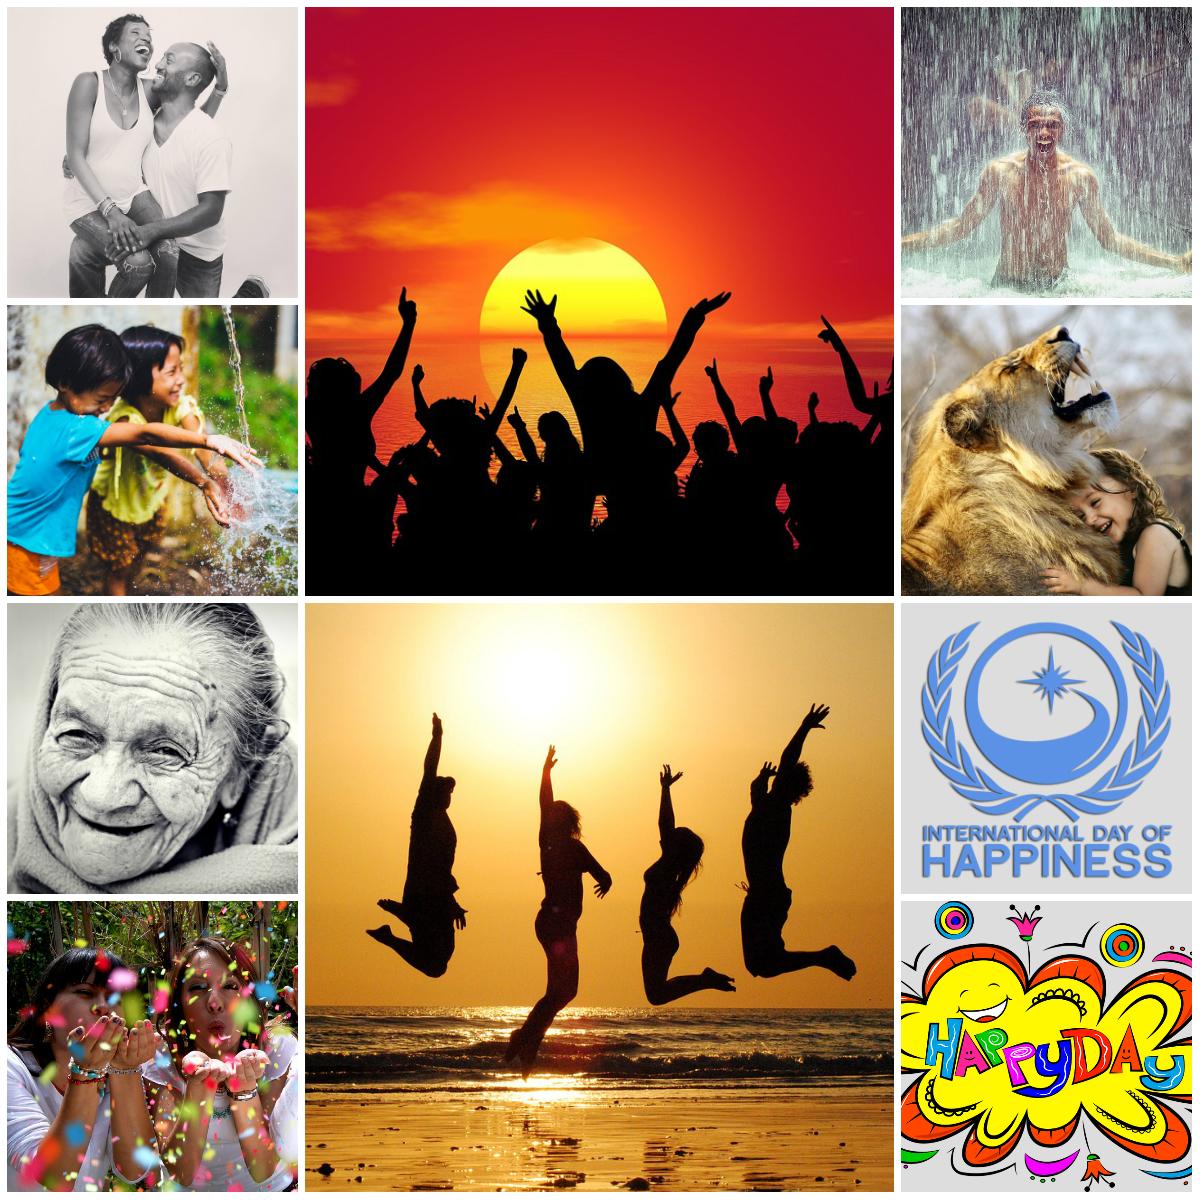 Motivation Mondays: Day of Happiness & Spring #internationaldayofhappiness